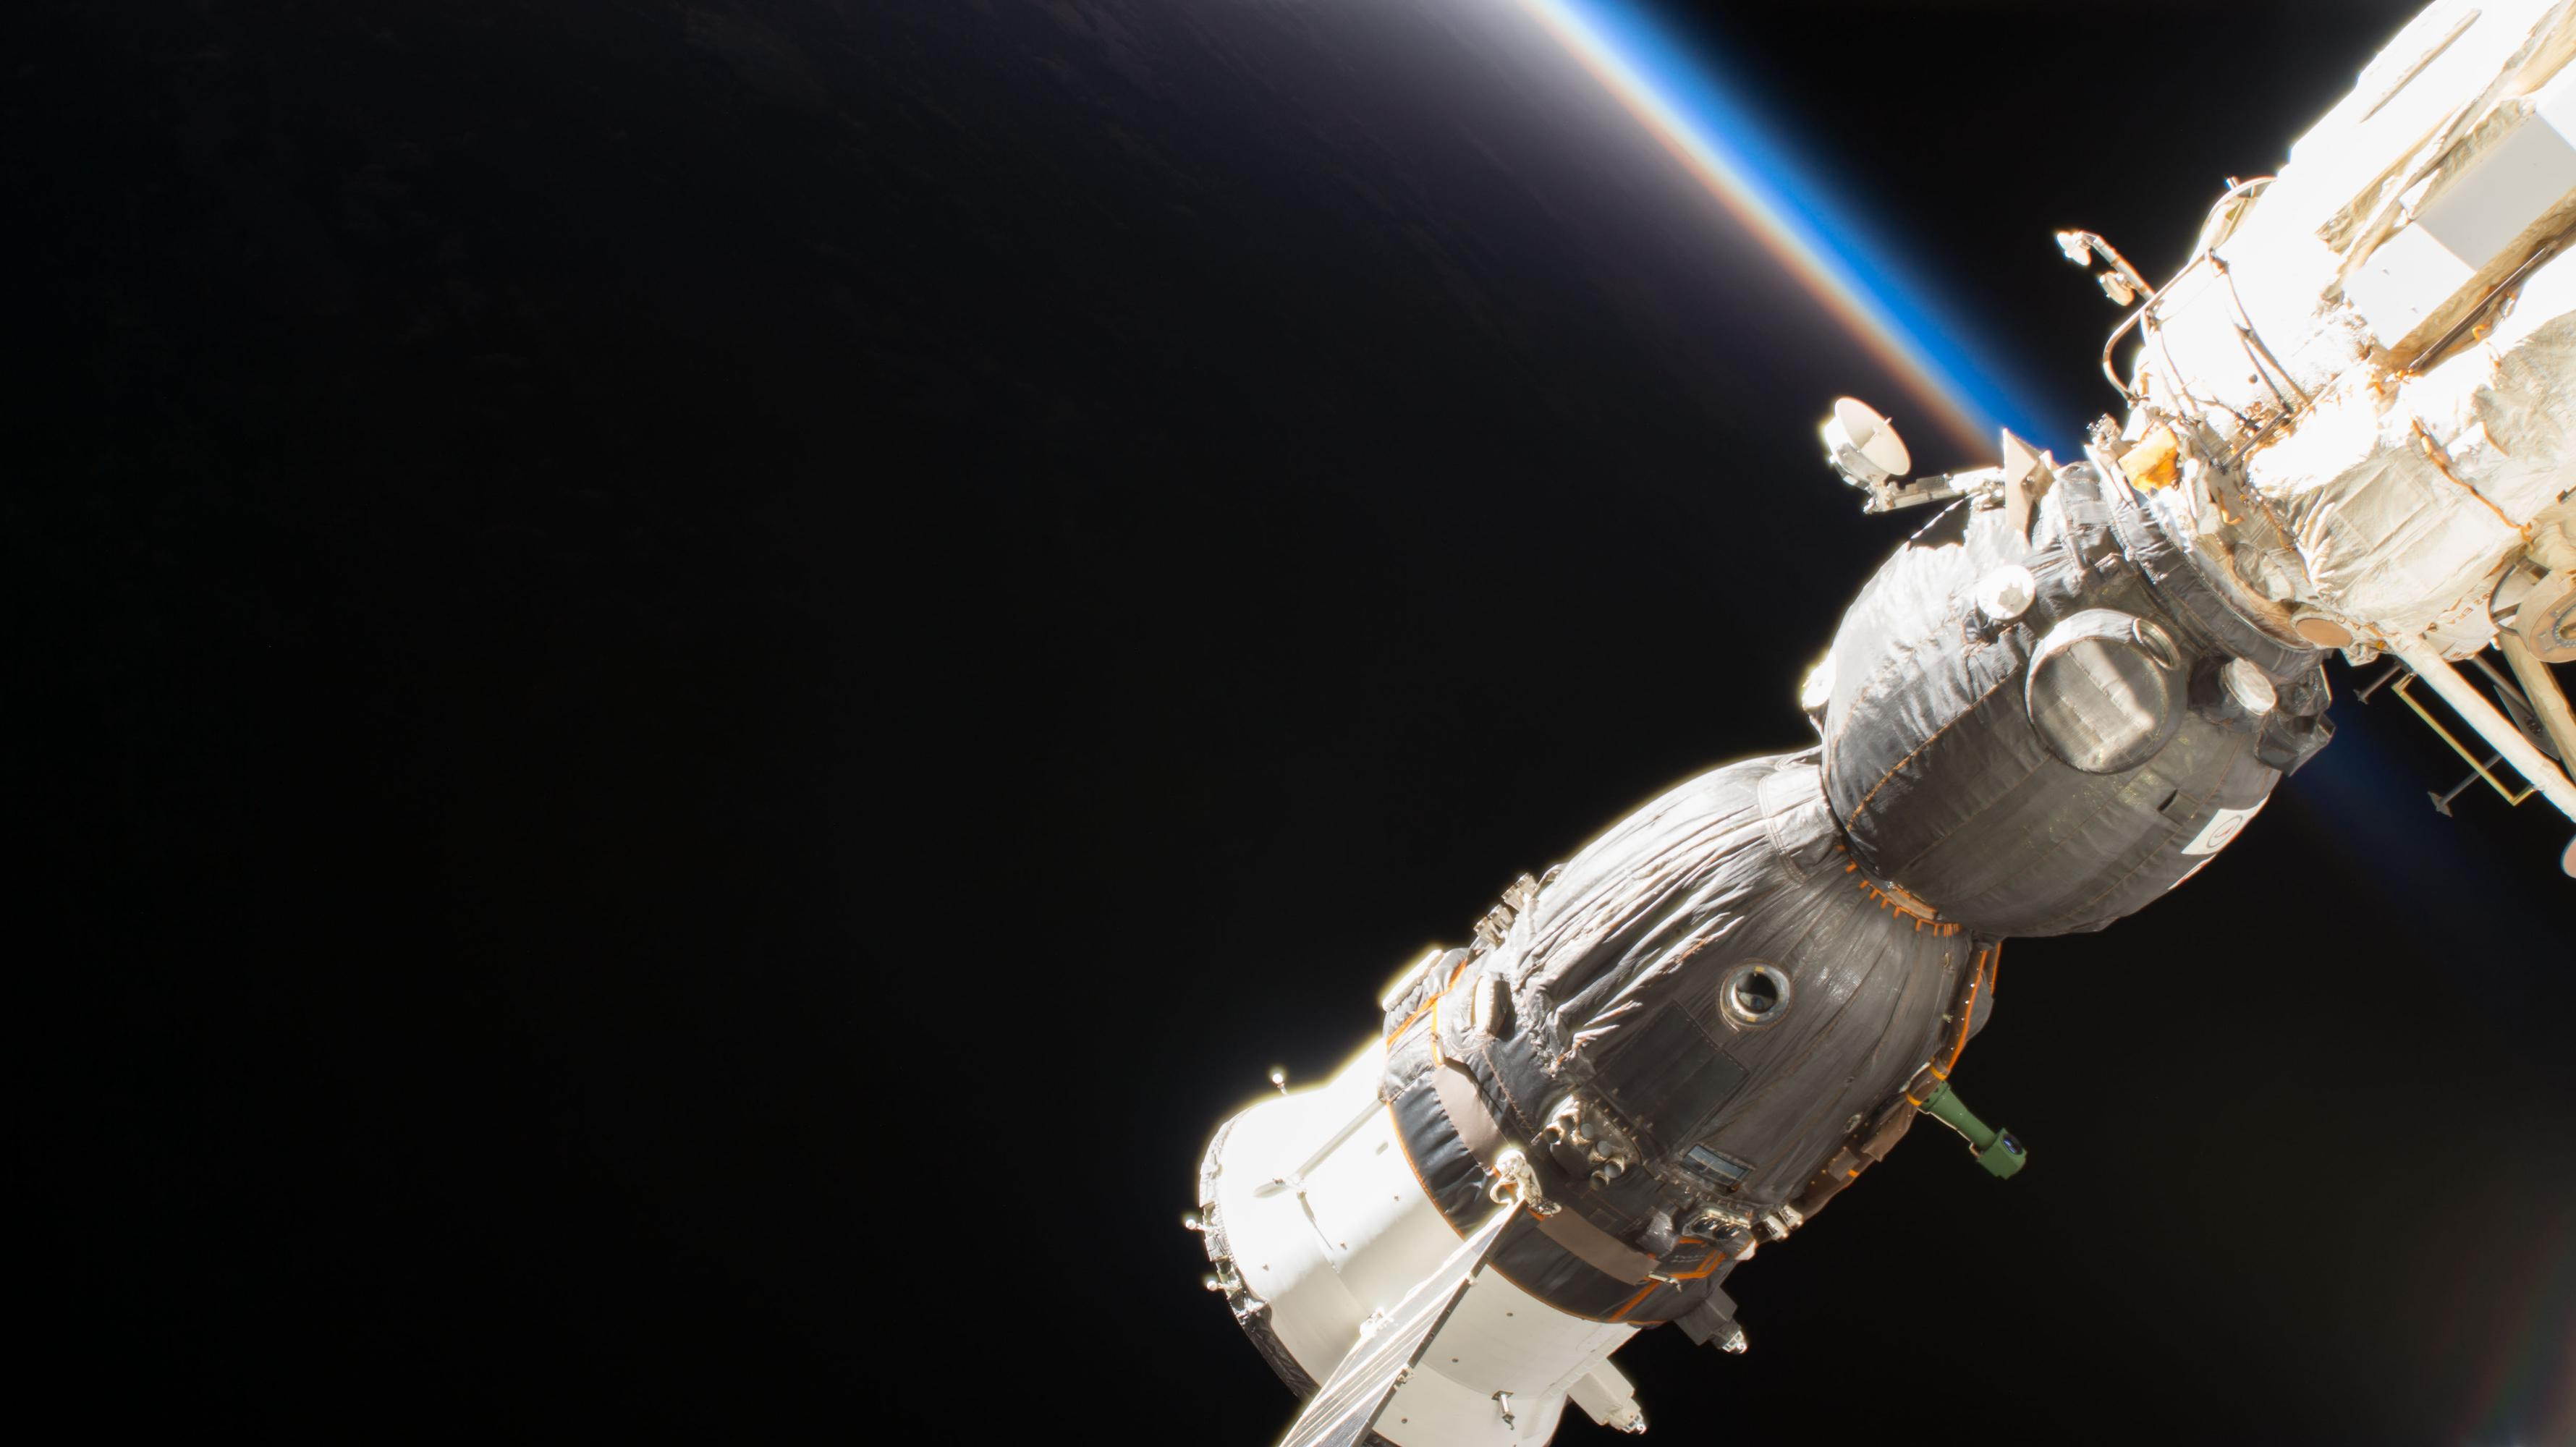 space station leak - HD2048×1150